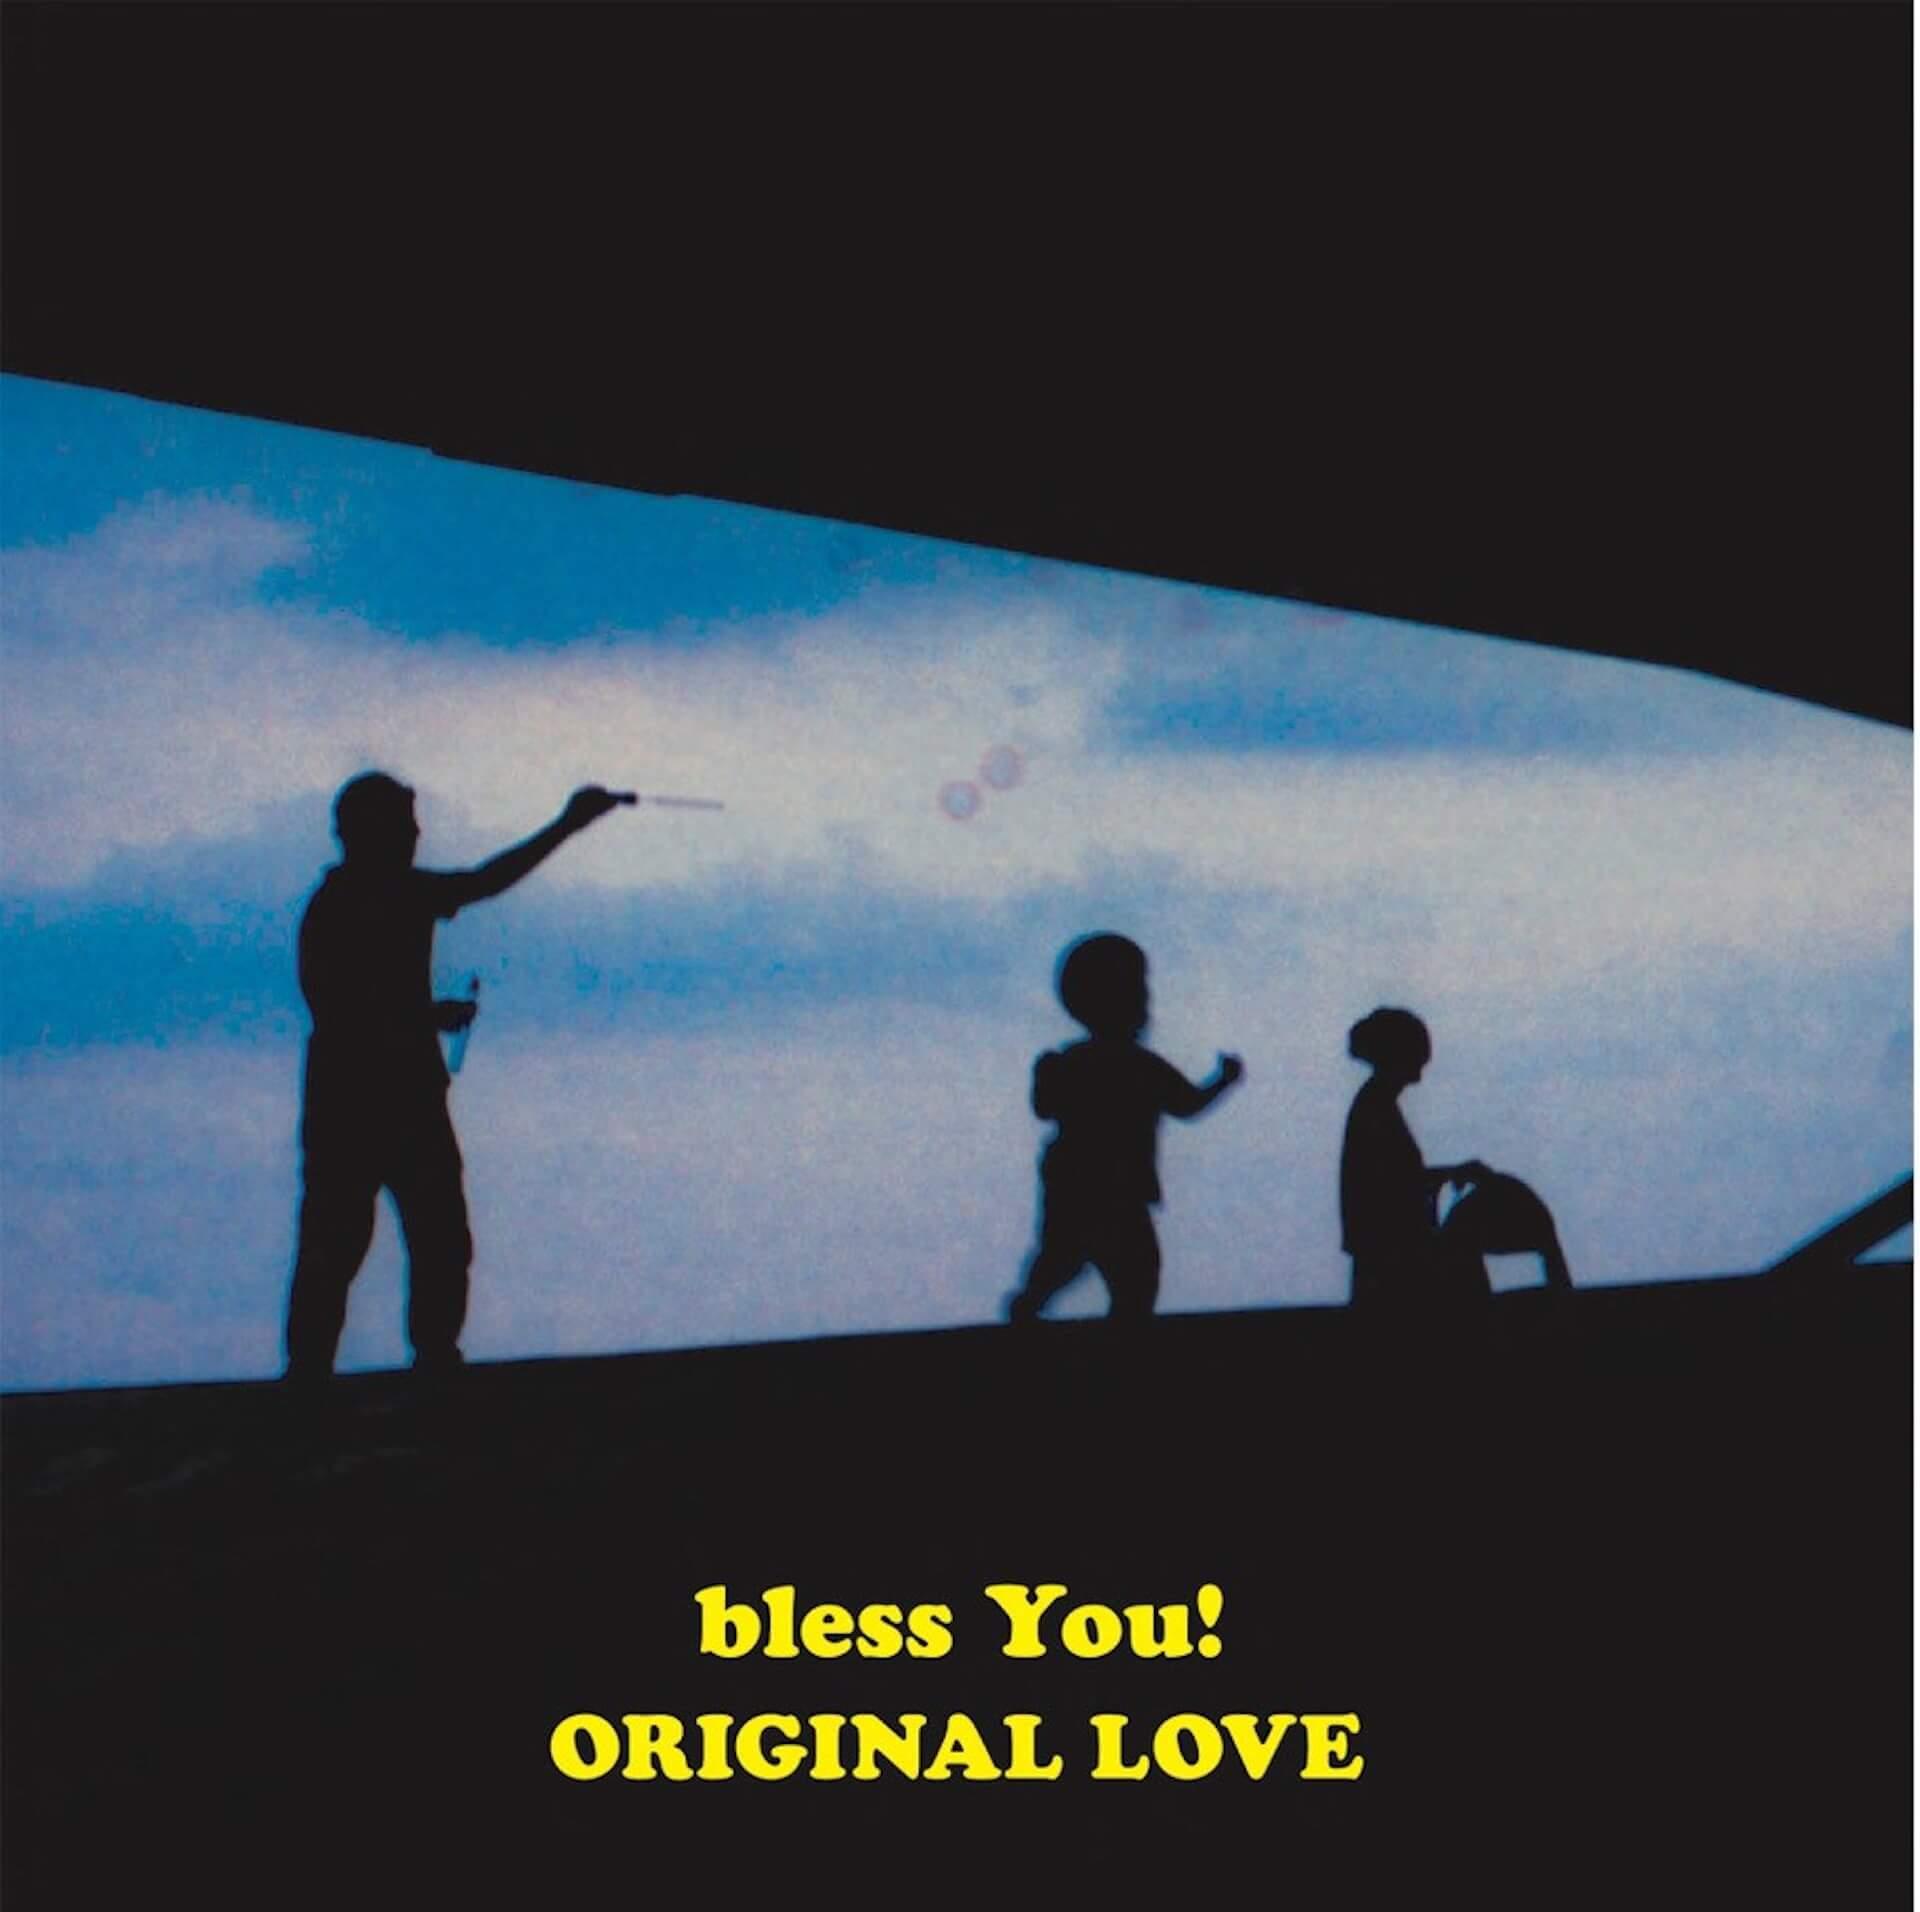 ORIGINAL LOVE、田島貴男自身がカッティング監修した新作『bless You!』のアナログ盤が本日リリース|<フジロック>ではPUNPEE、長岡亮介が飛び入りし話題に music190821-originallove-2